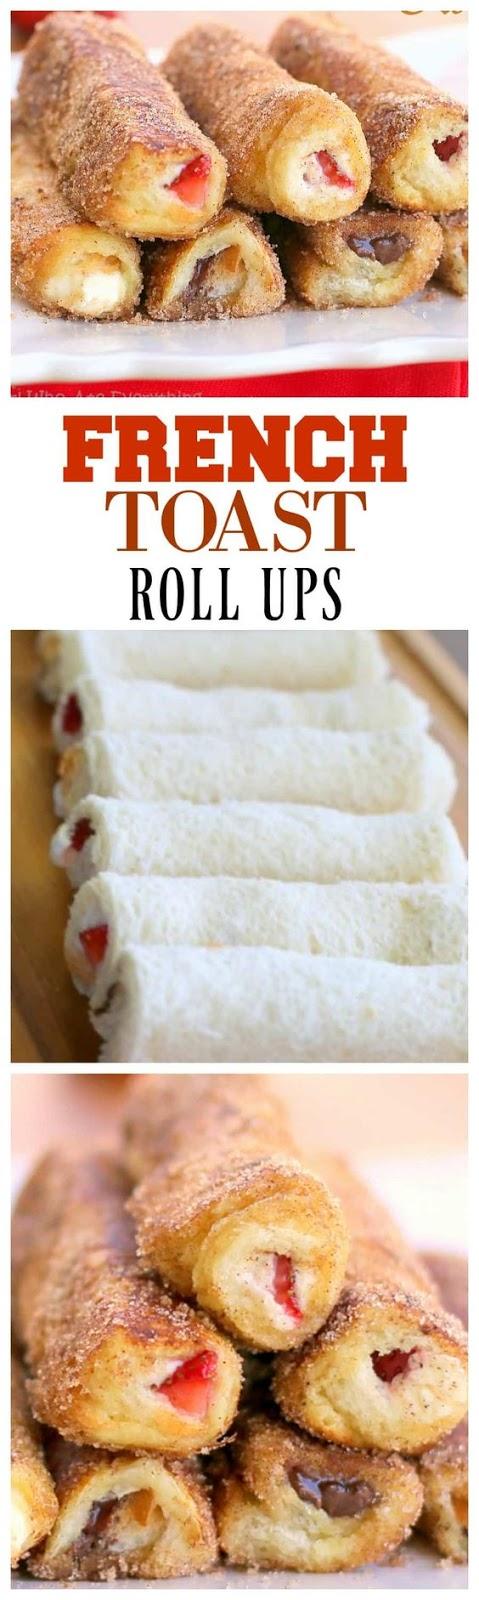 French Toast Roll-Ups Recipe - Cucina de Yung